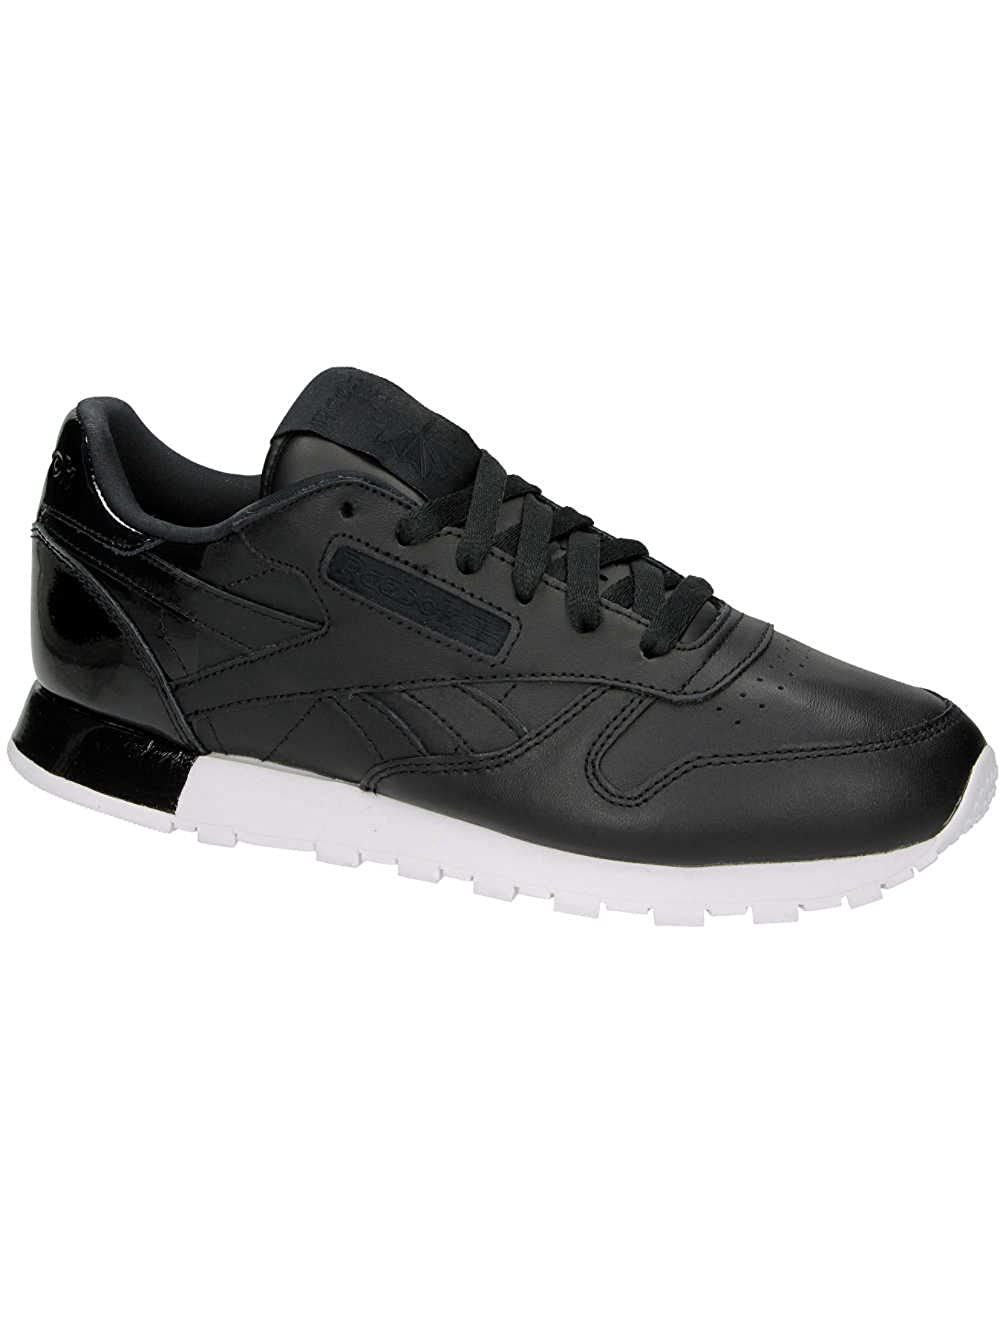 37c0bb2a1ffc3 Reebok Classic Leather Matte Shine Black  Amazon.co.uk  Shoes   Bags